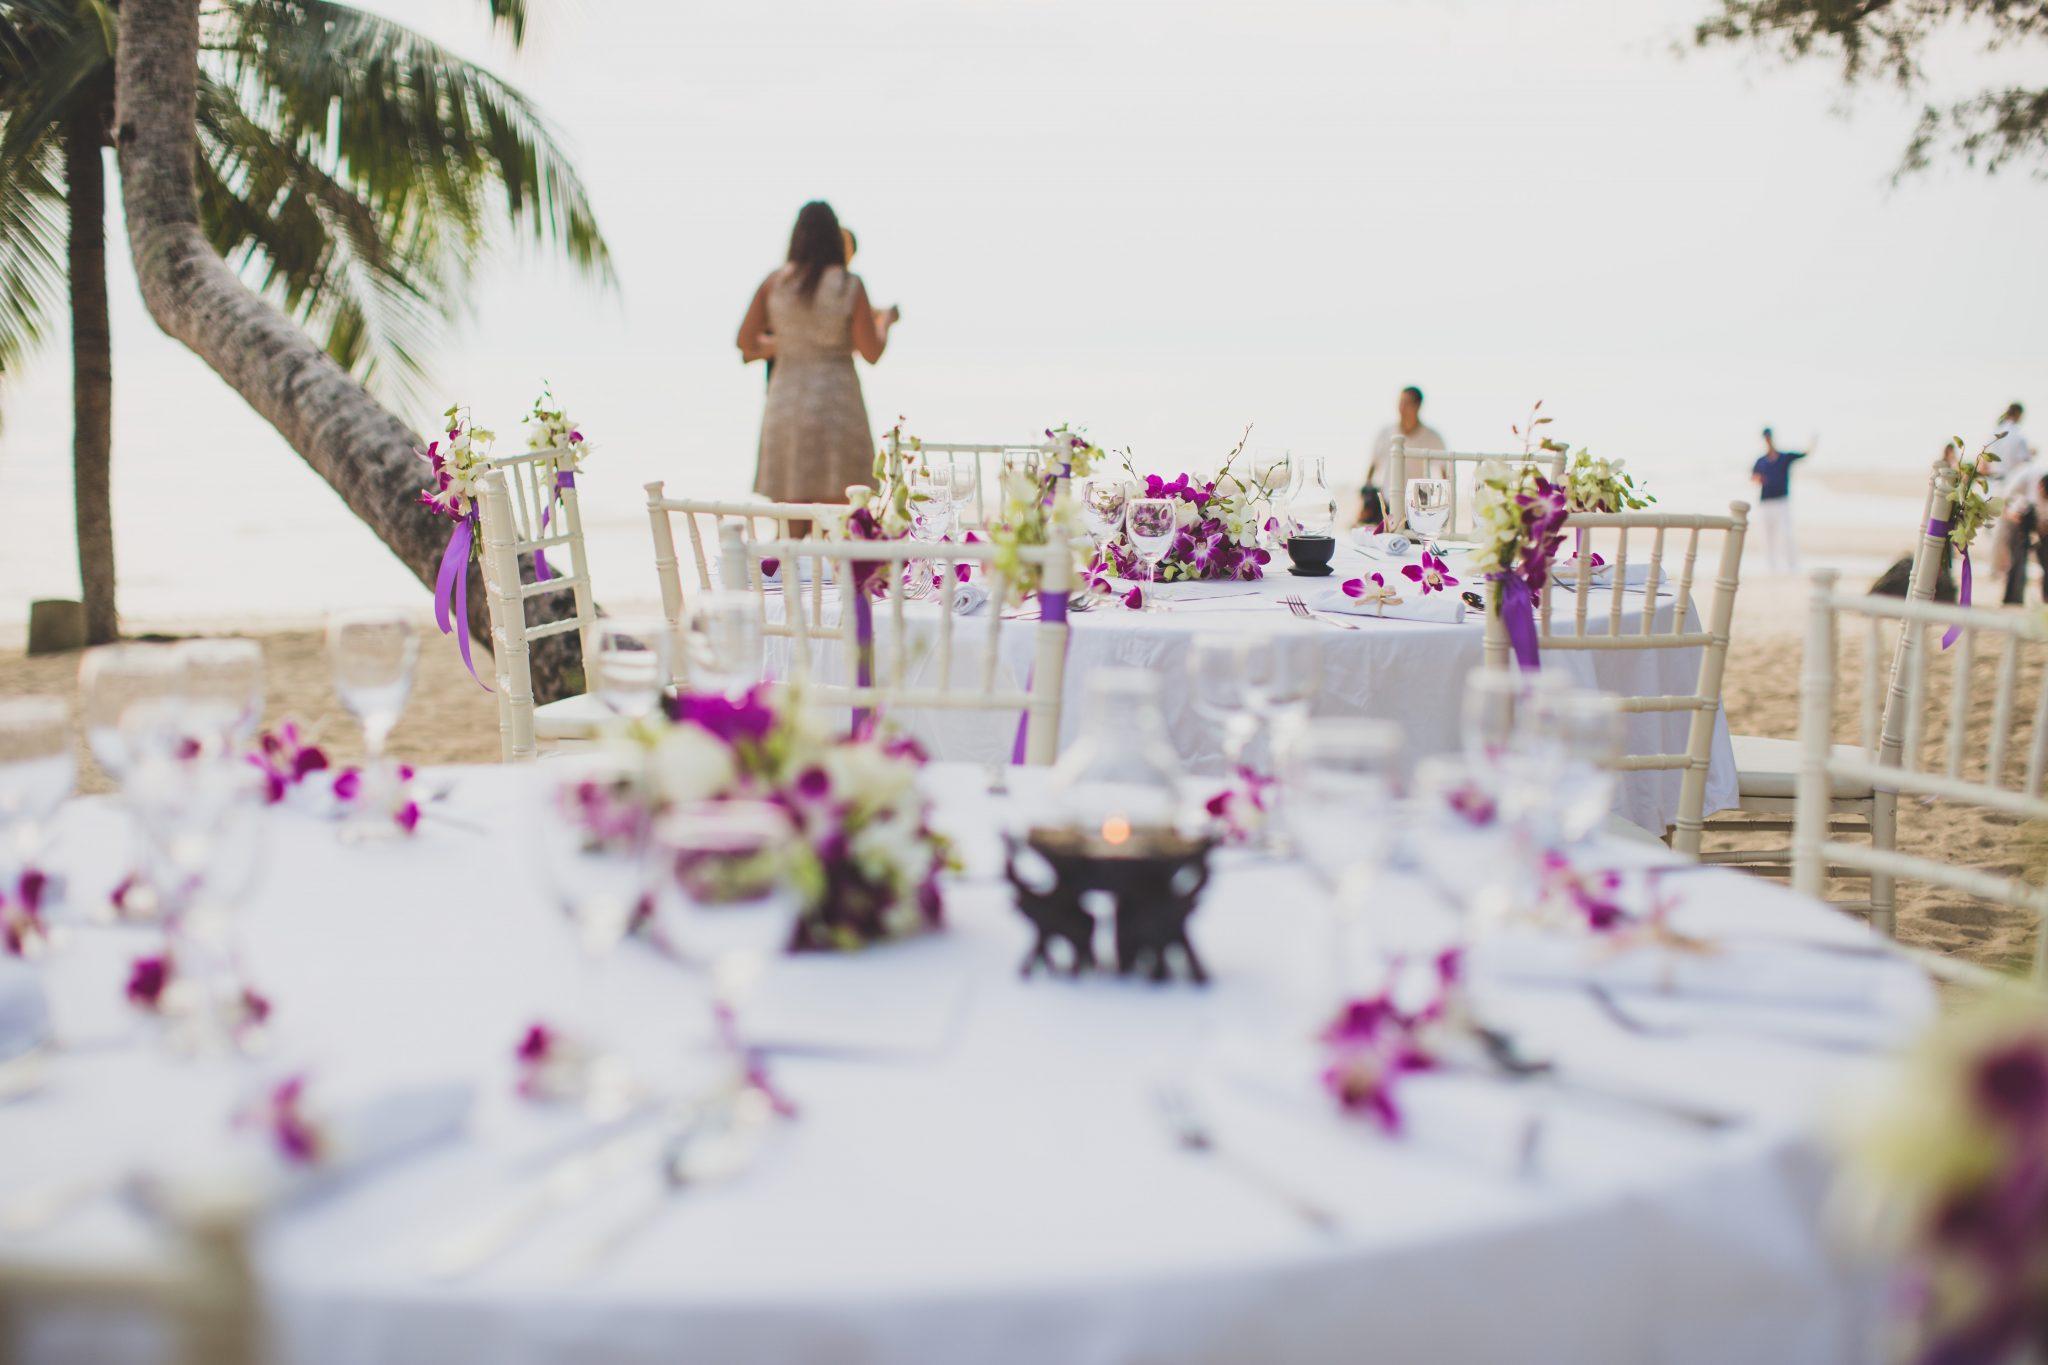 Organisation-Mariage-marier-maries-mariee-ceremonie-Thailande-Plage-ile-Koh-Samui-Island-thai-evenementiel-evenements-demande-fiancailles-EVJF-EVG-noces-voyages-Wedding-ceremony-Planner-Thailand-Beach-Events-event-request-bachelor-bachelorette-groom-bride-bridal-diner-dinner-celebratin-love-family-famille-amour-couple-12